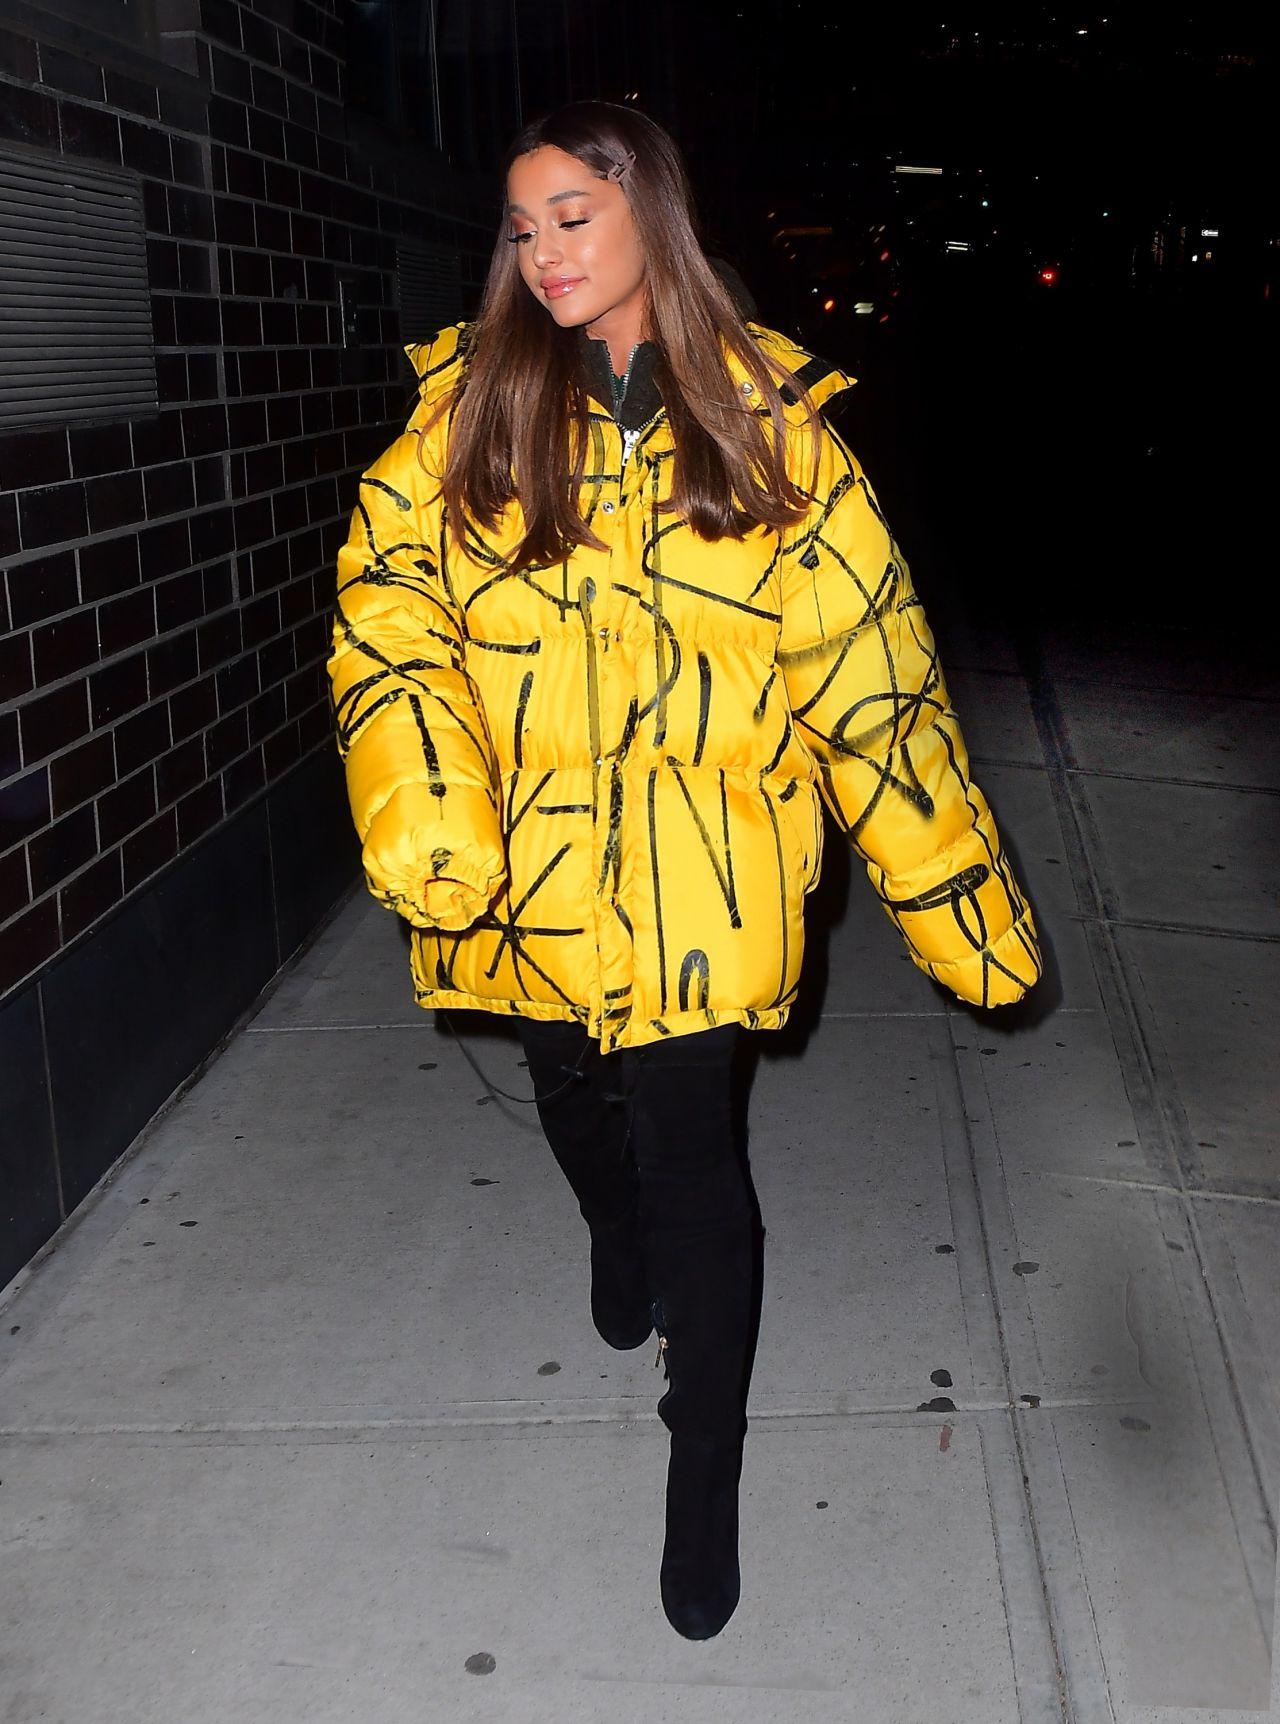 Ariana Grande In Oversized Yellow Puffer Jacket 12 11 2018